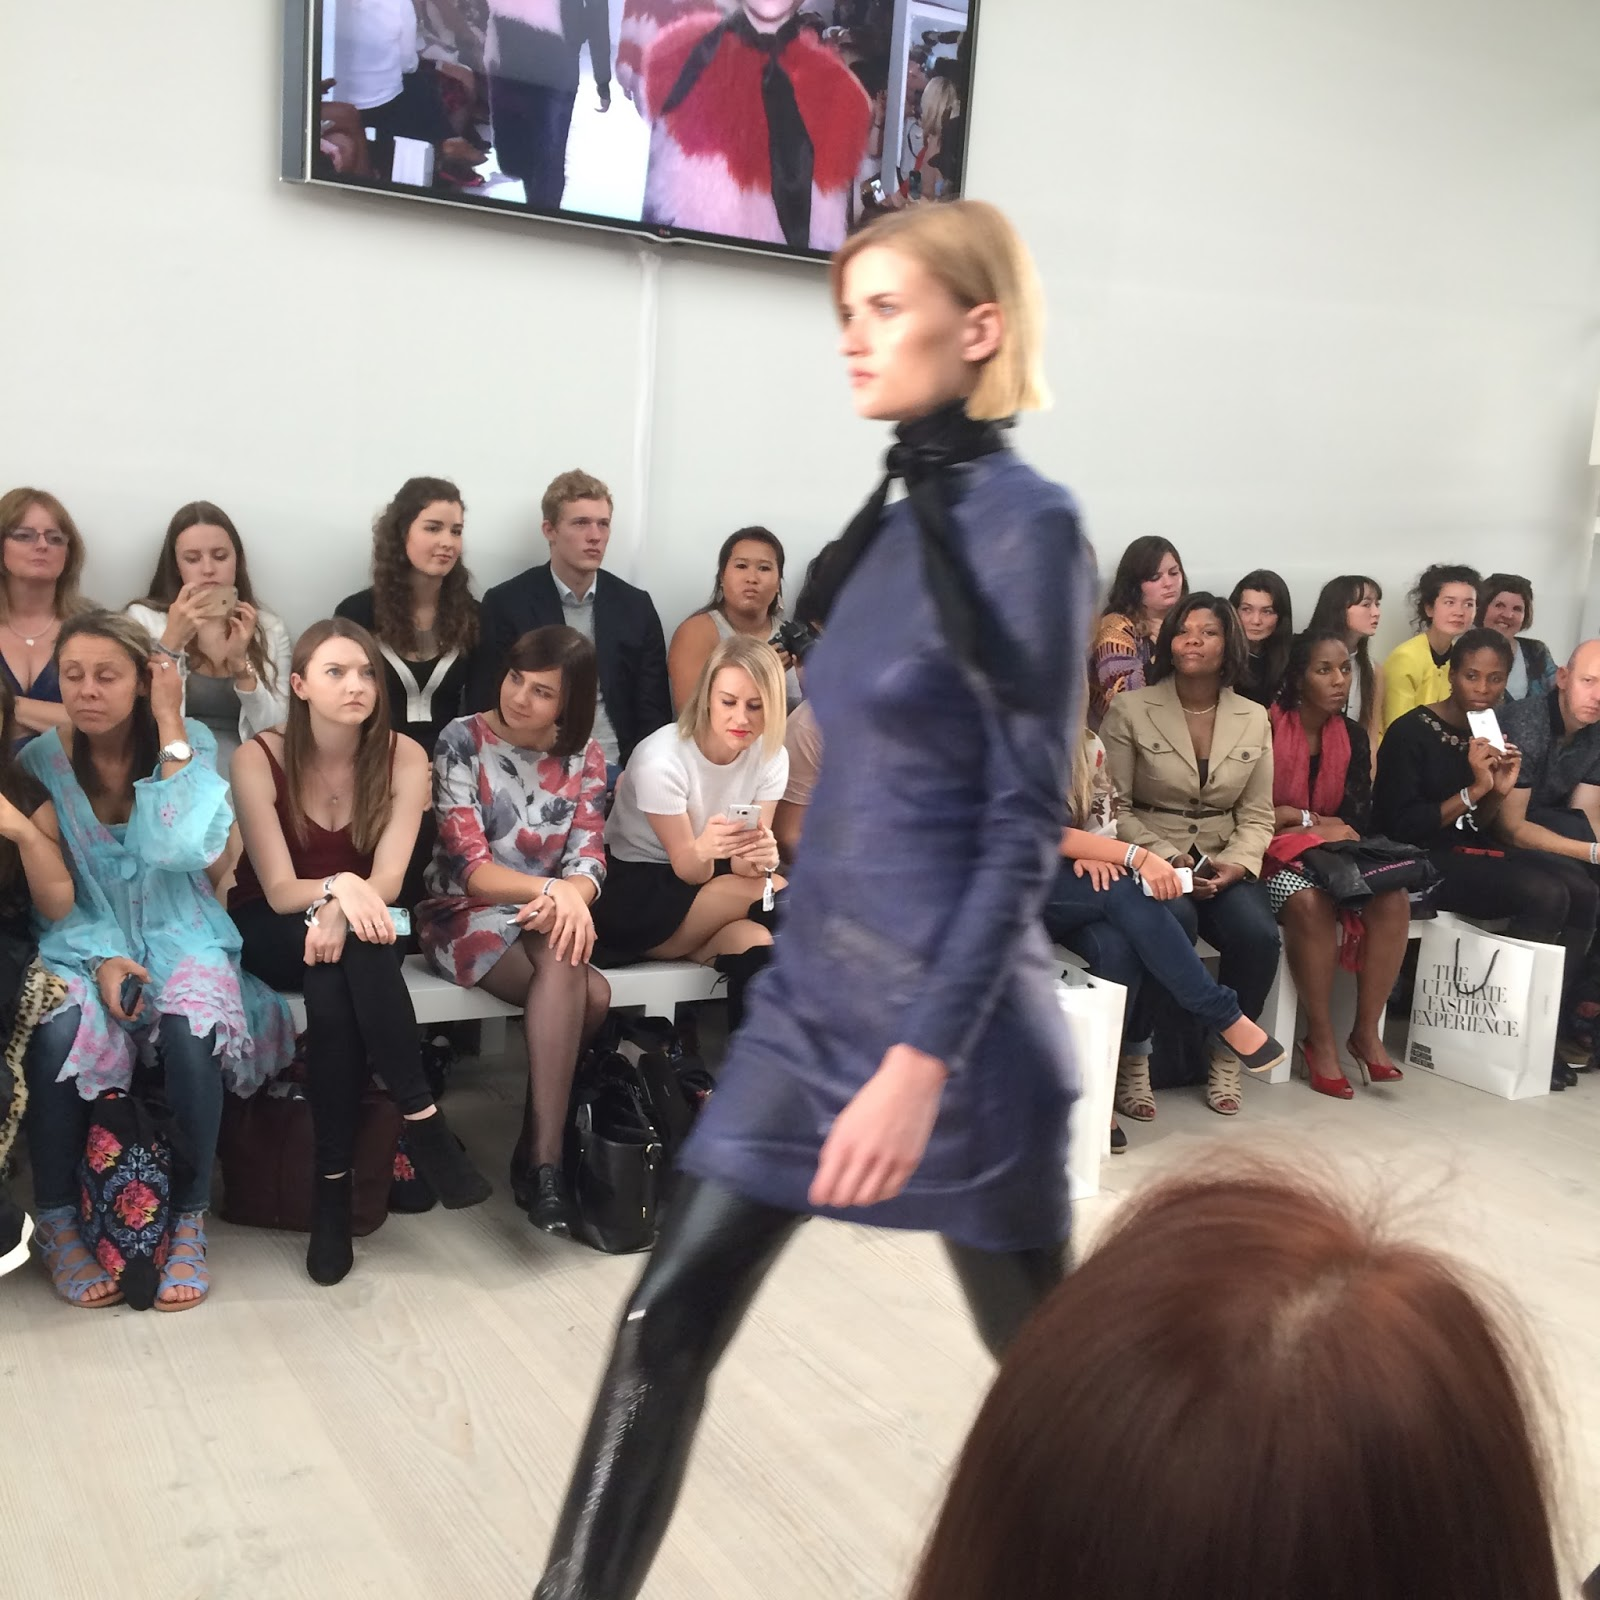 London Fashion Week Festival - Reviews Facebook 74